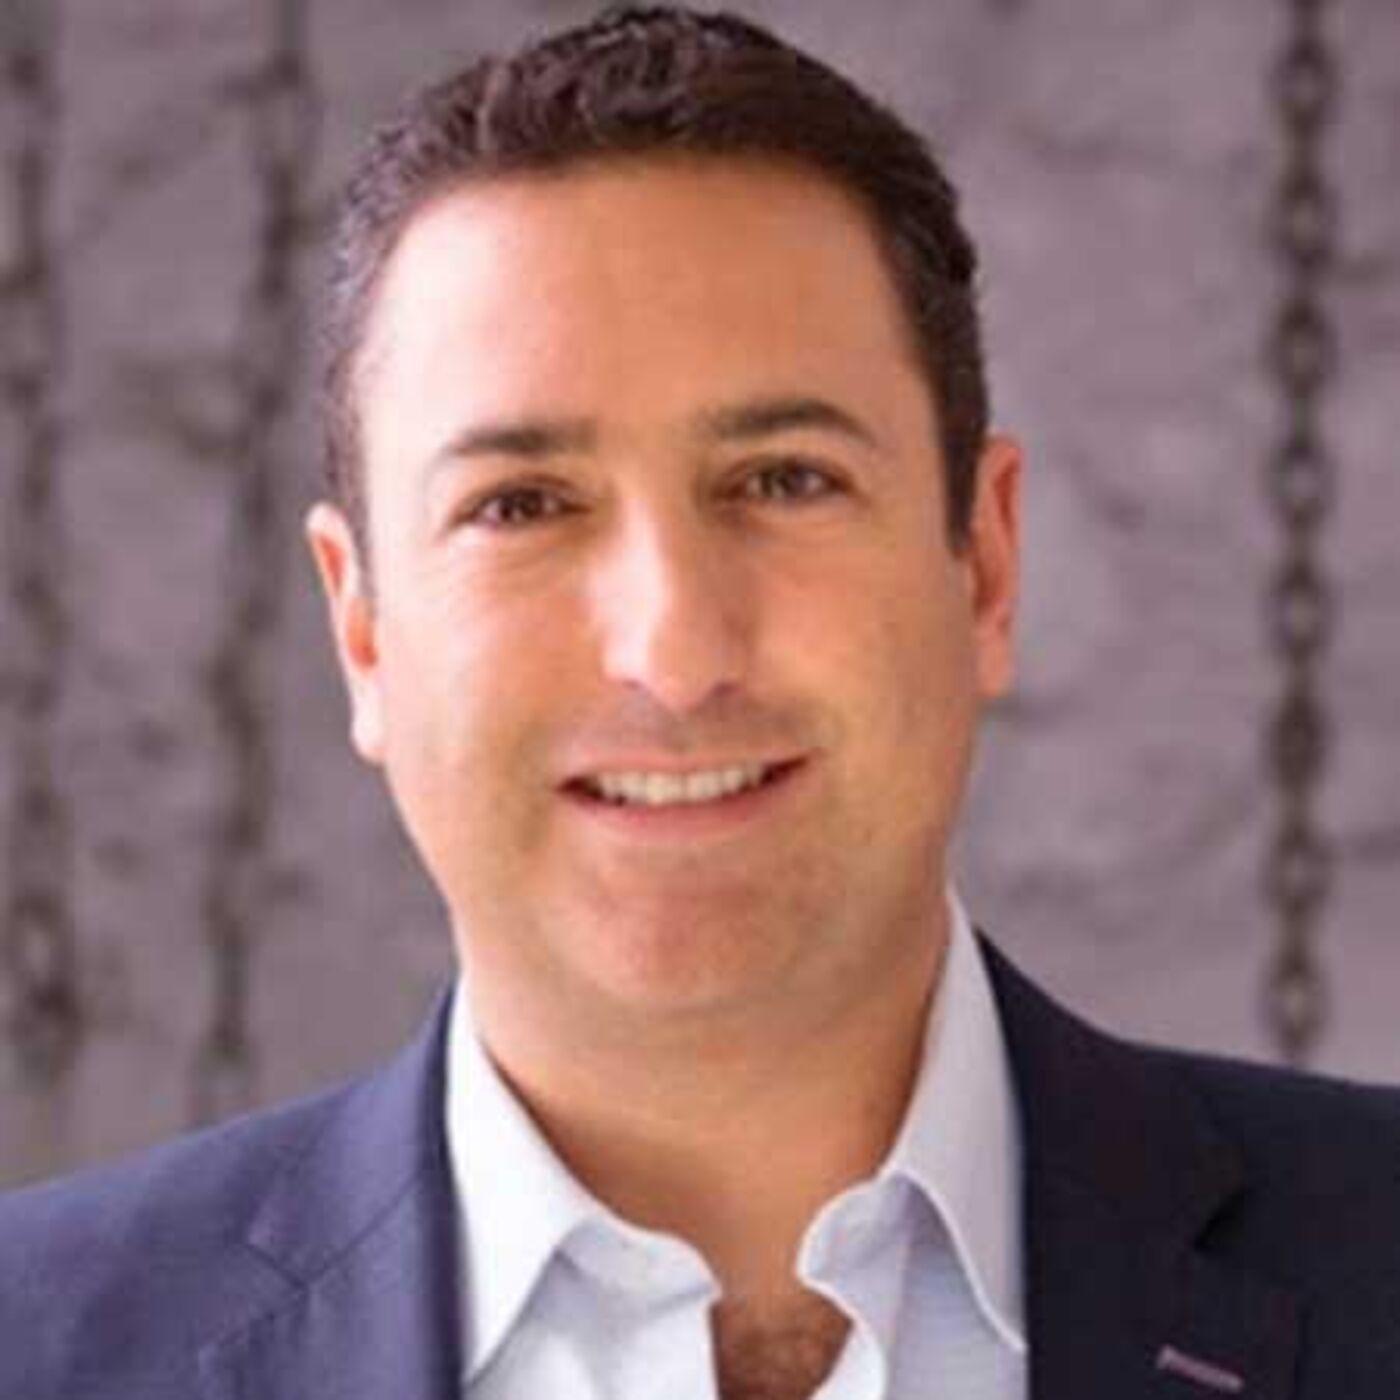 #12: Simon Cohen, Chairman at Henco Global